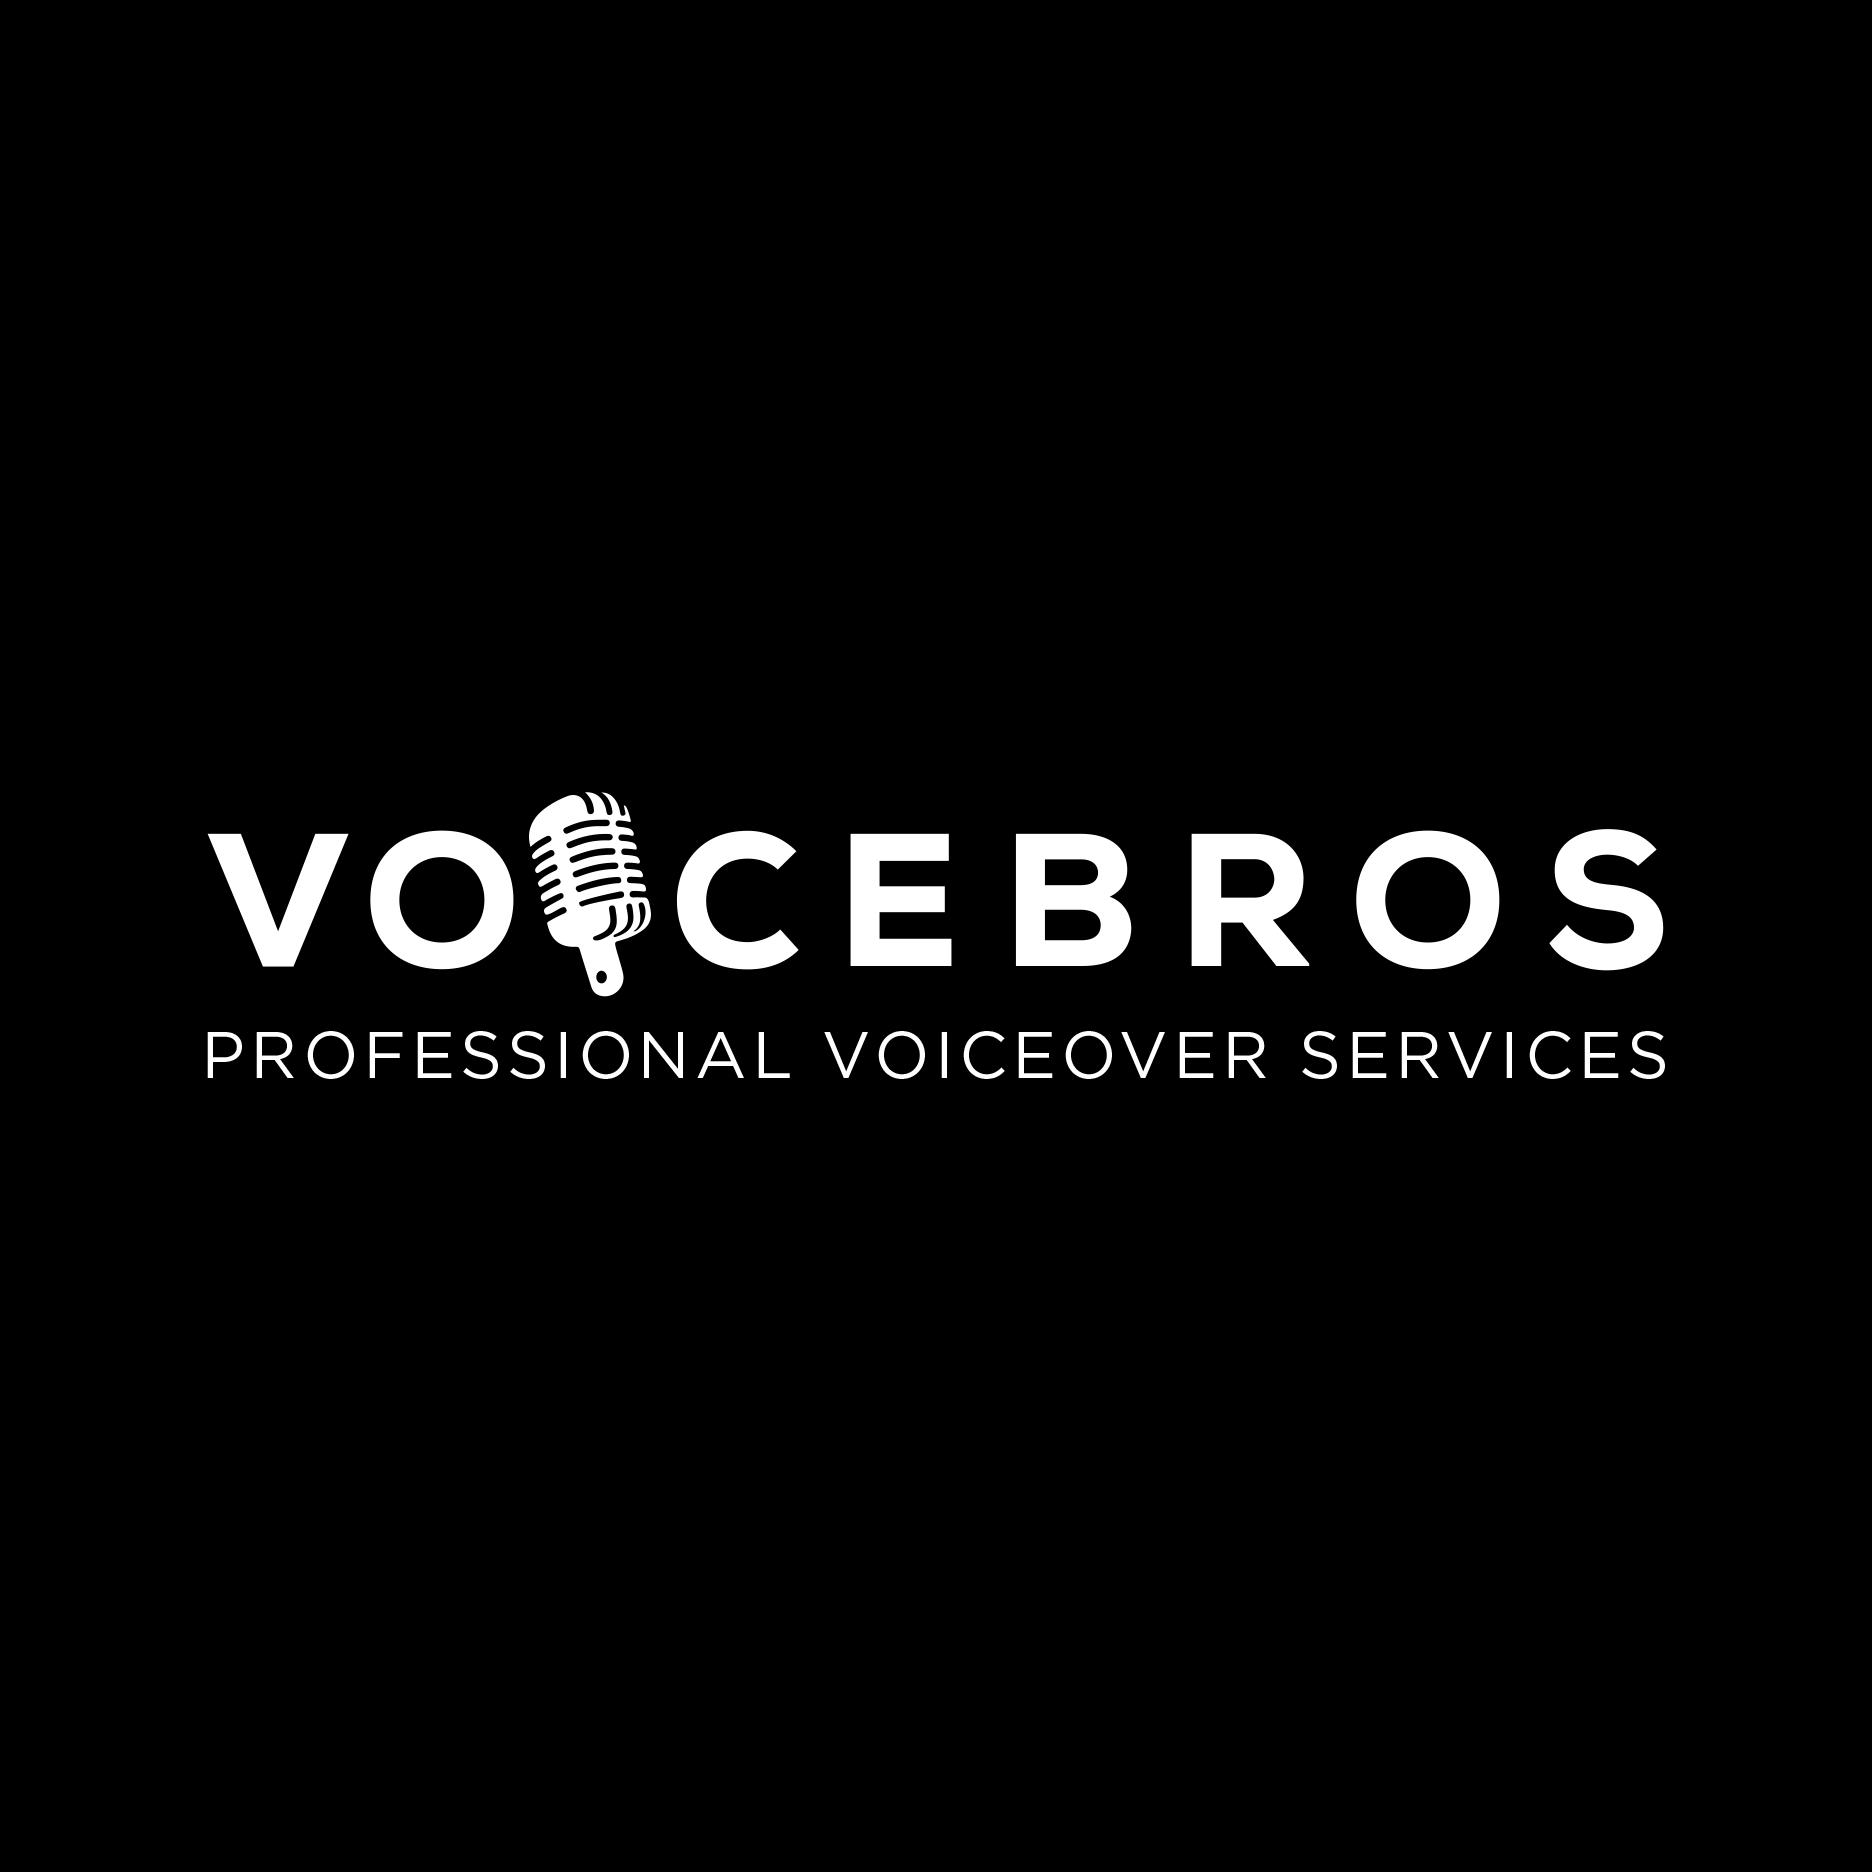 Daniel C. is a voice over actor